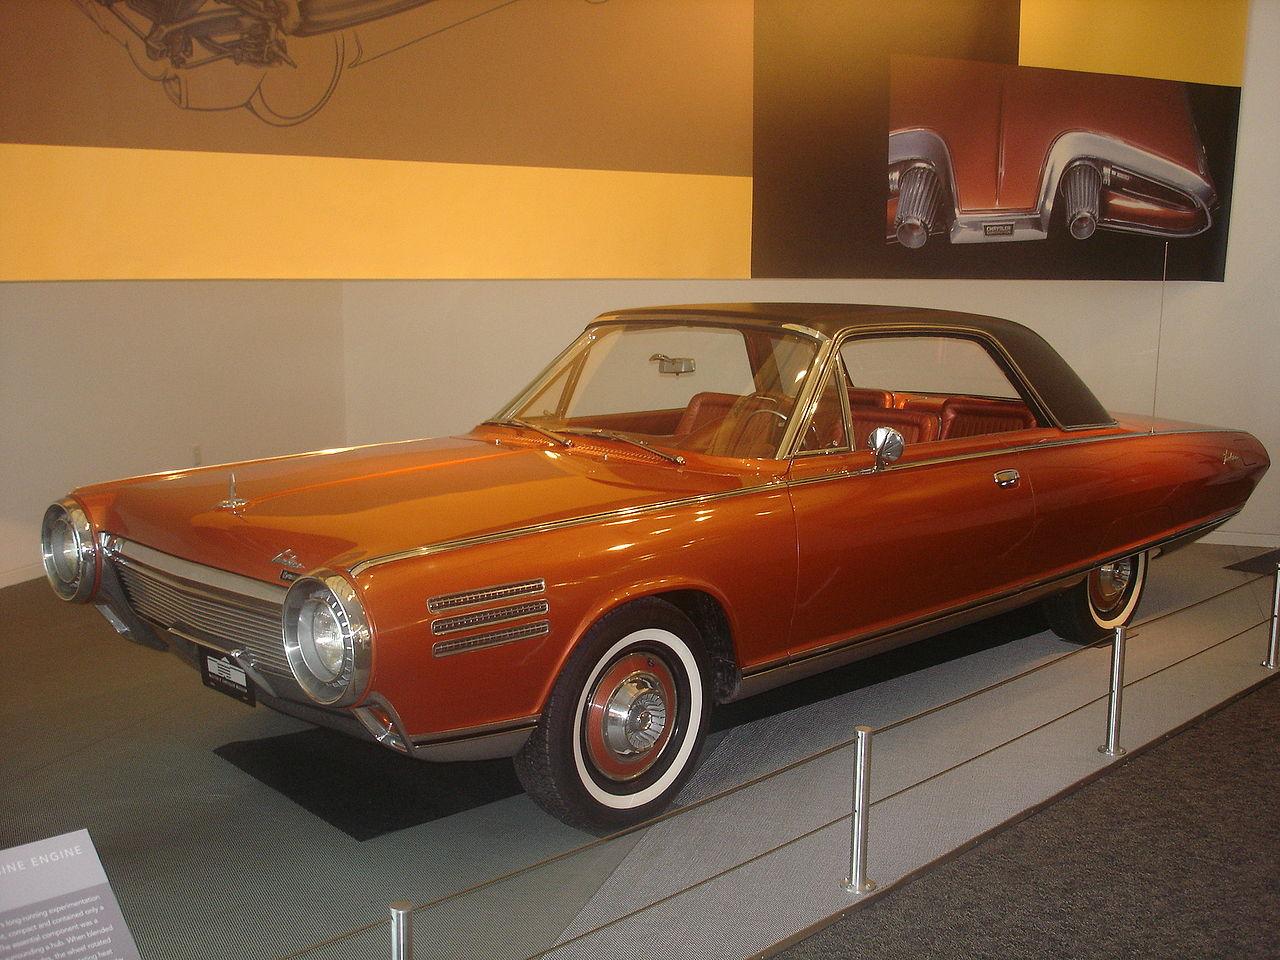 "Crysler's Tequila slurping gas turbine car ""The Bronze Blowtorch"" (Picture courtesy Wikipedia)."